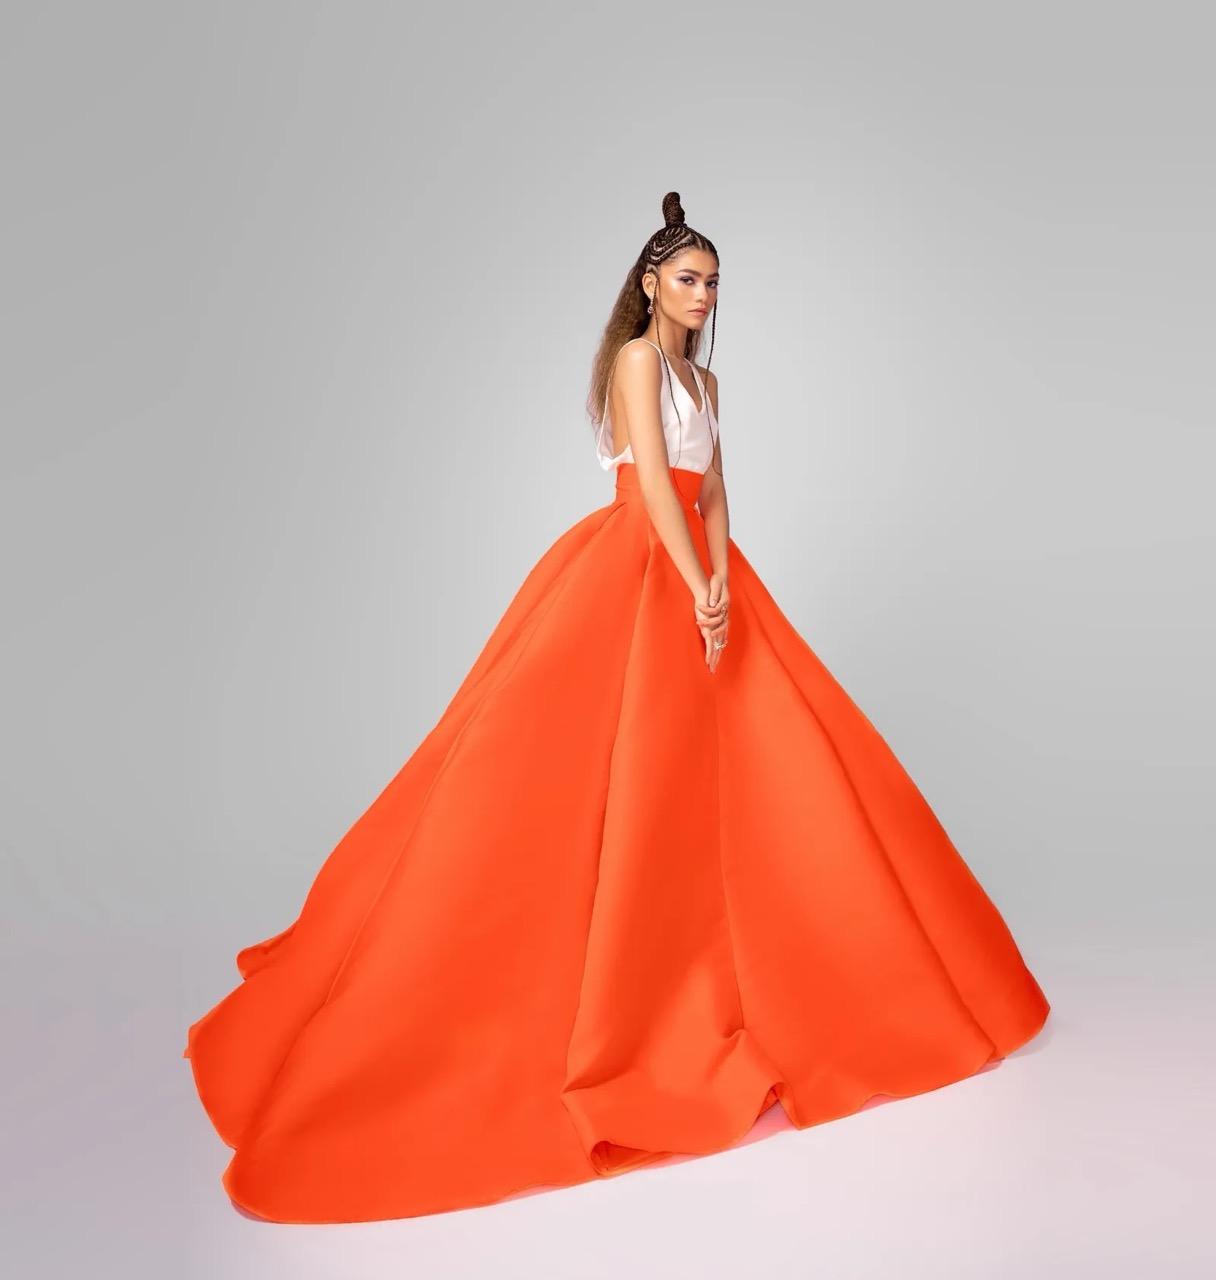 Зендея вValentino Couture